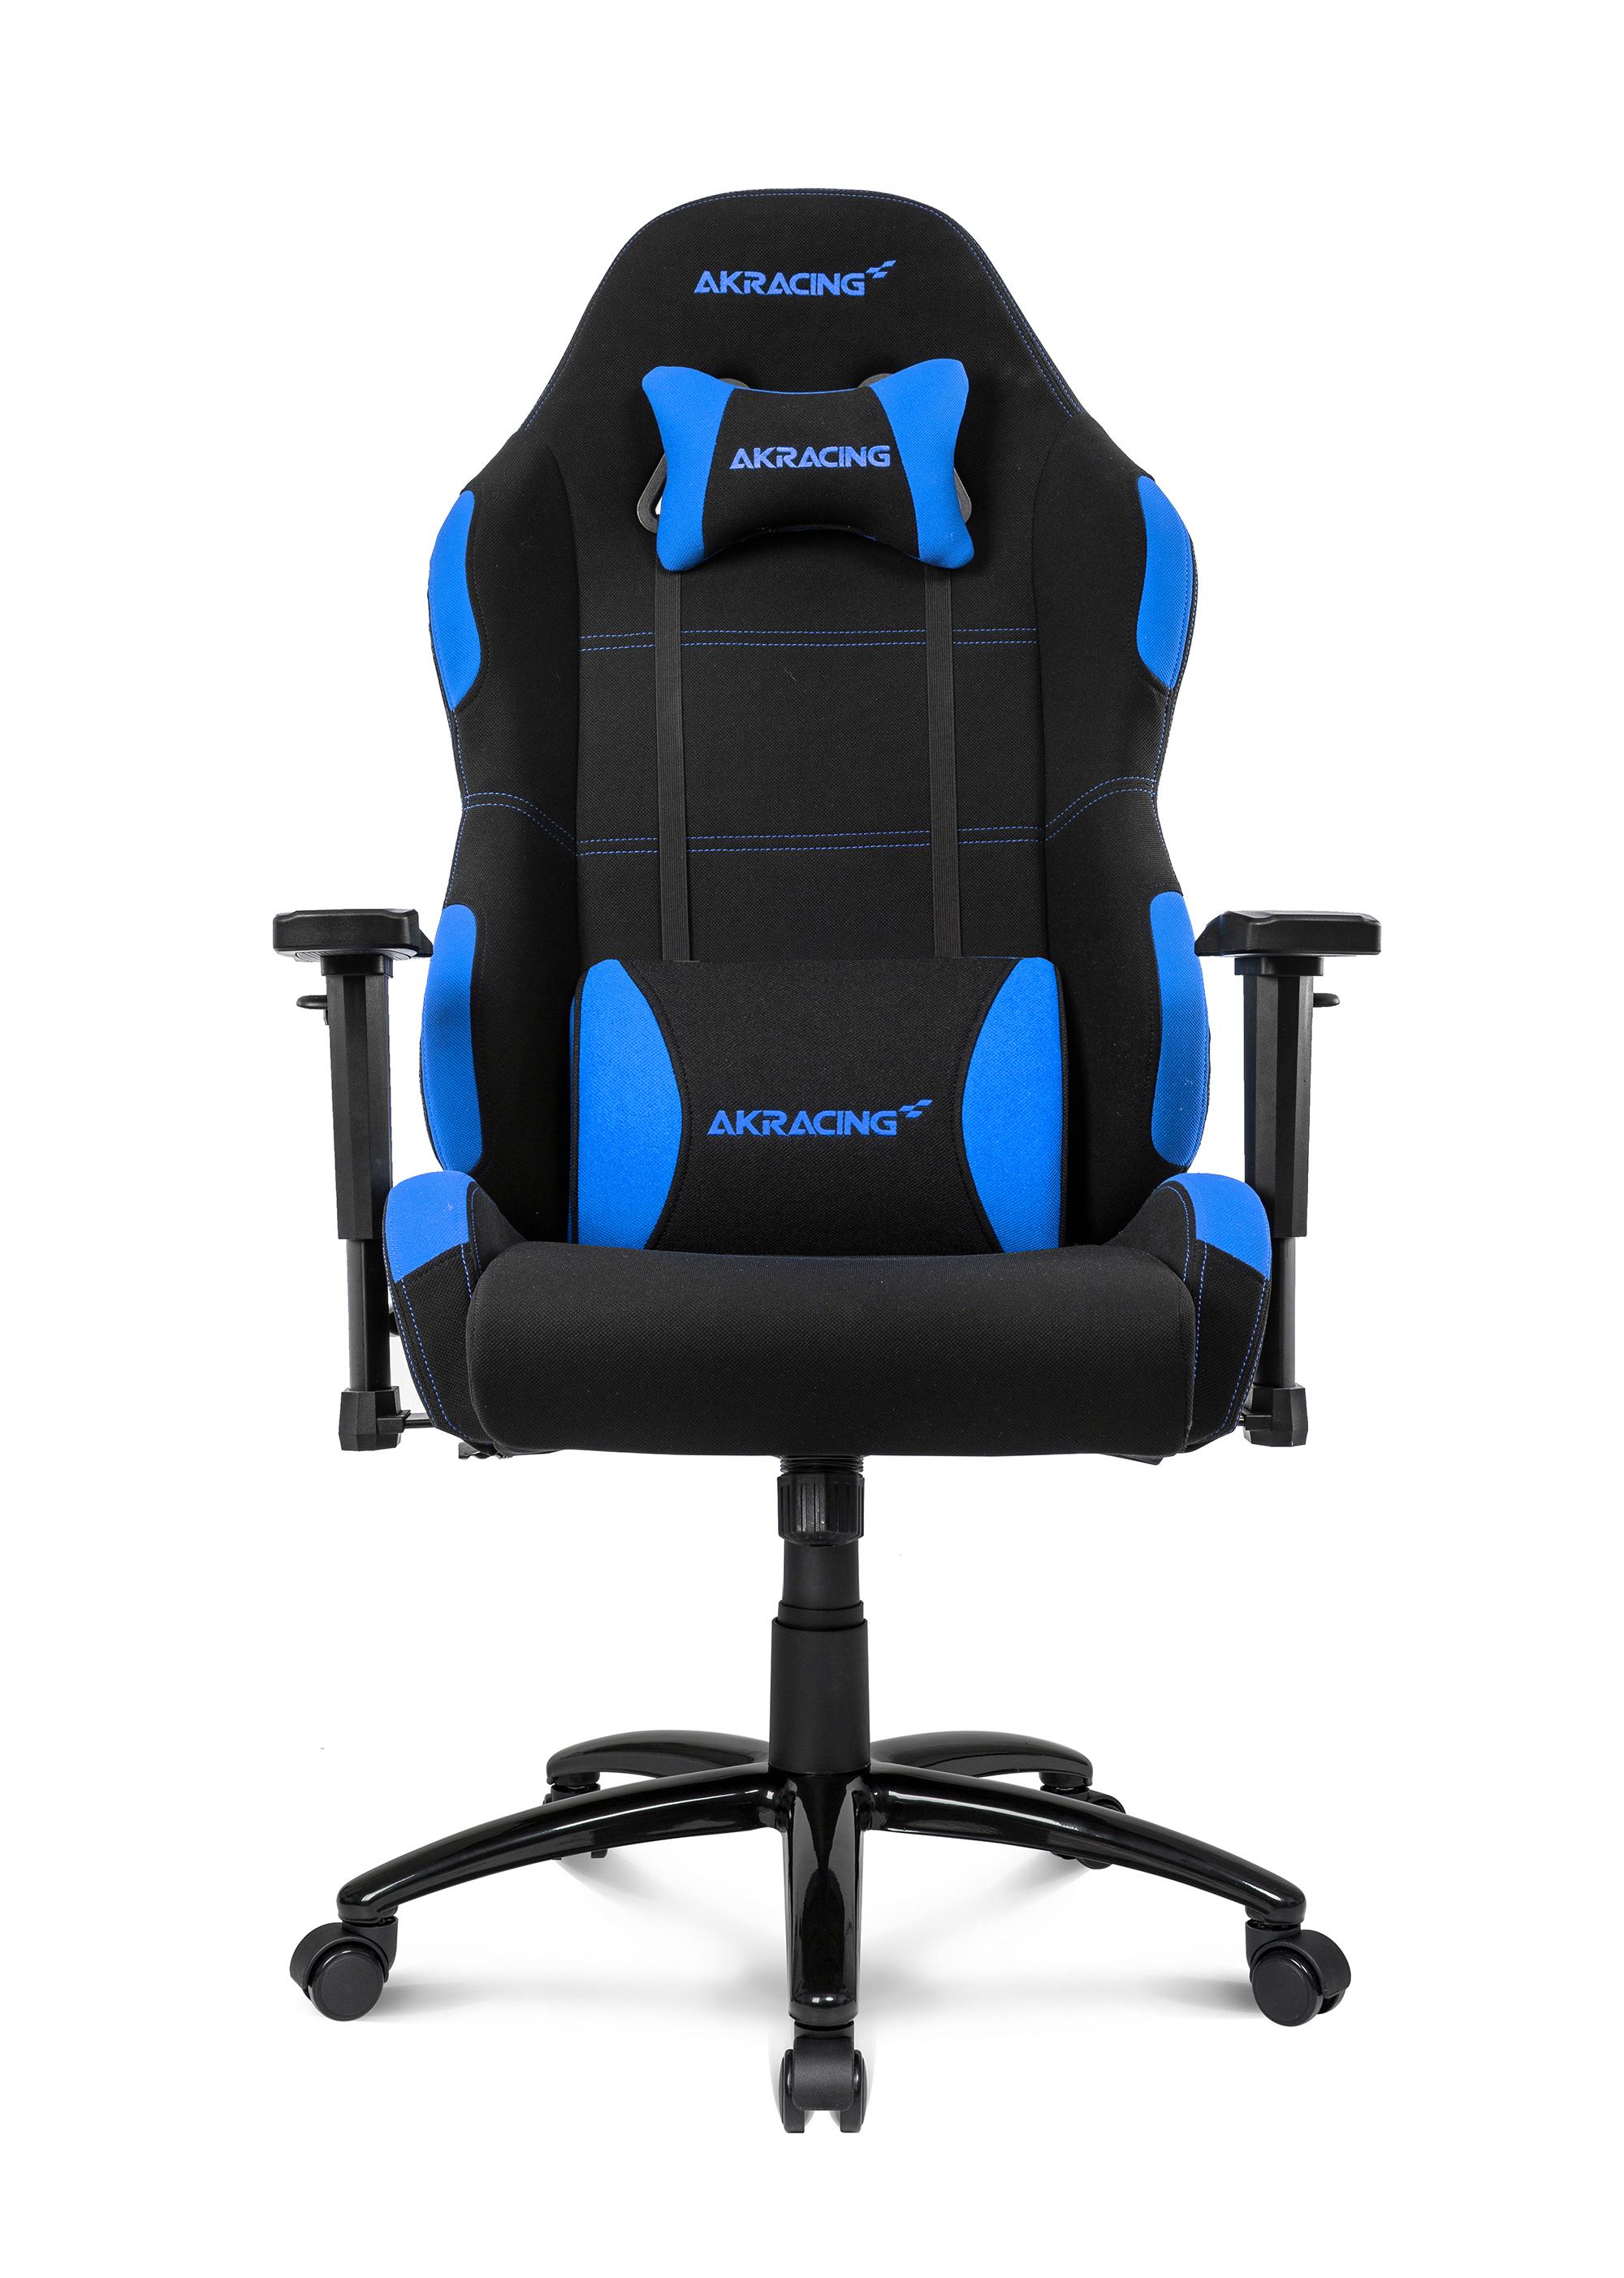 AKRacing EX-Wide - PC-Gamingstuhl - PC - 150 kg - Gepolsterter - ausgestopfter Sitz - Gepolsterte - ausgestopfte Rückenlehne - Rennen